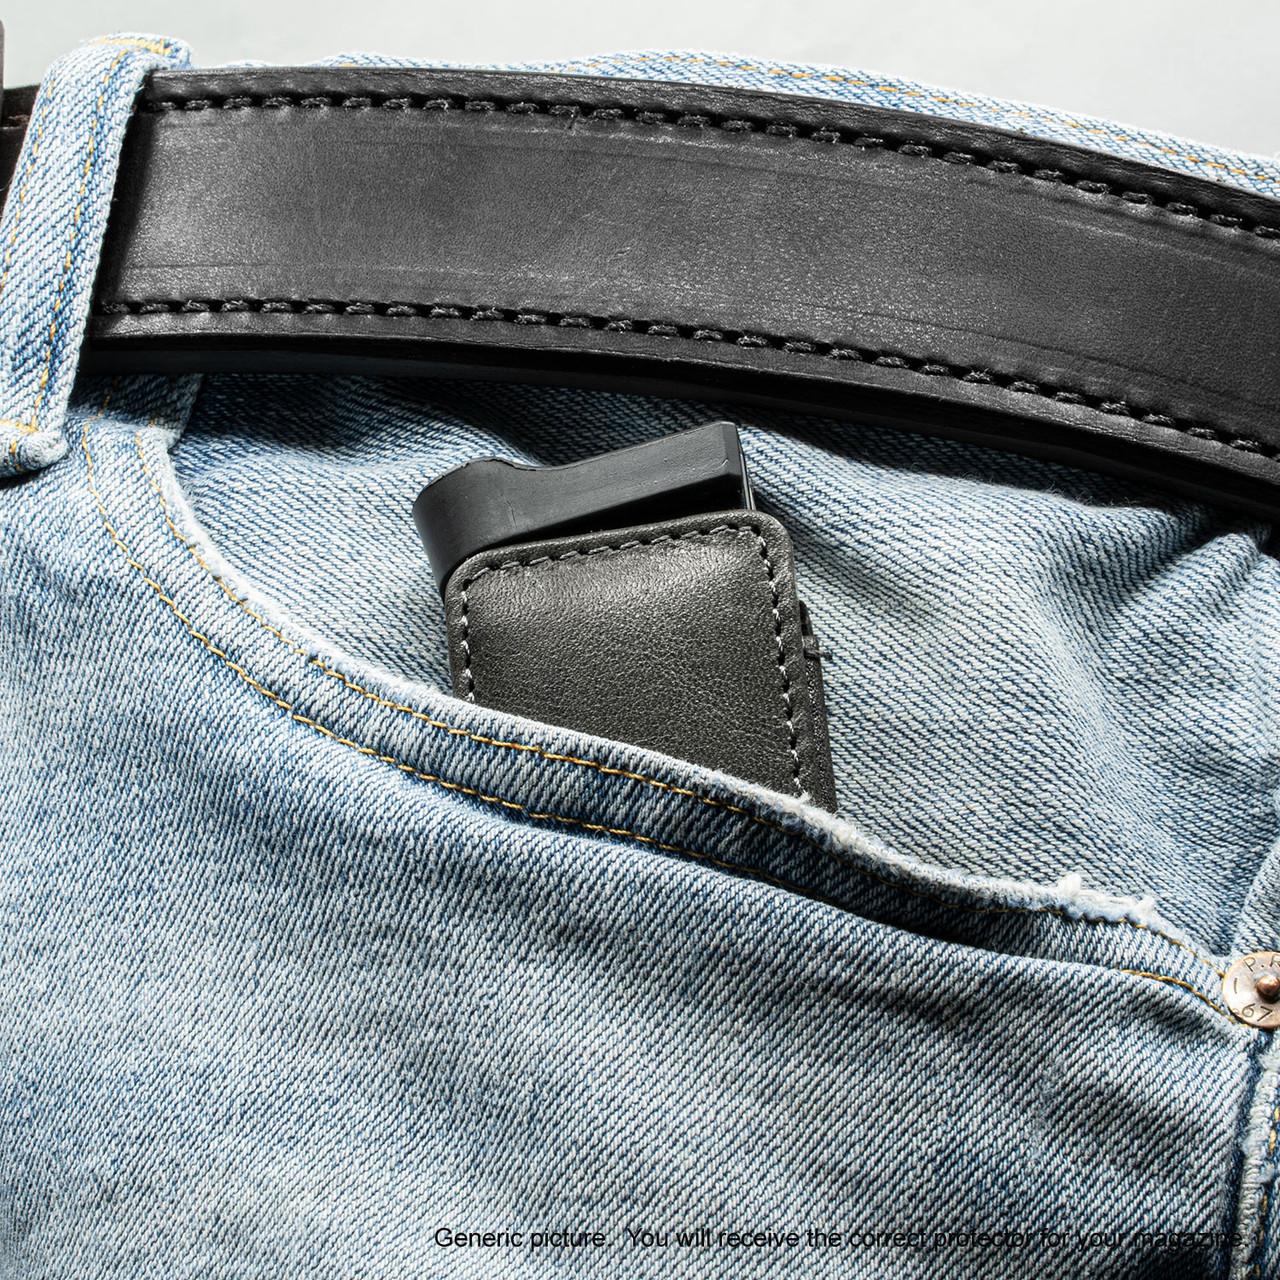 Sig Sauer P230 Black Freedom Magazine Pocket Protector